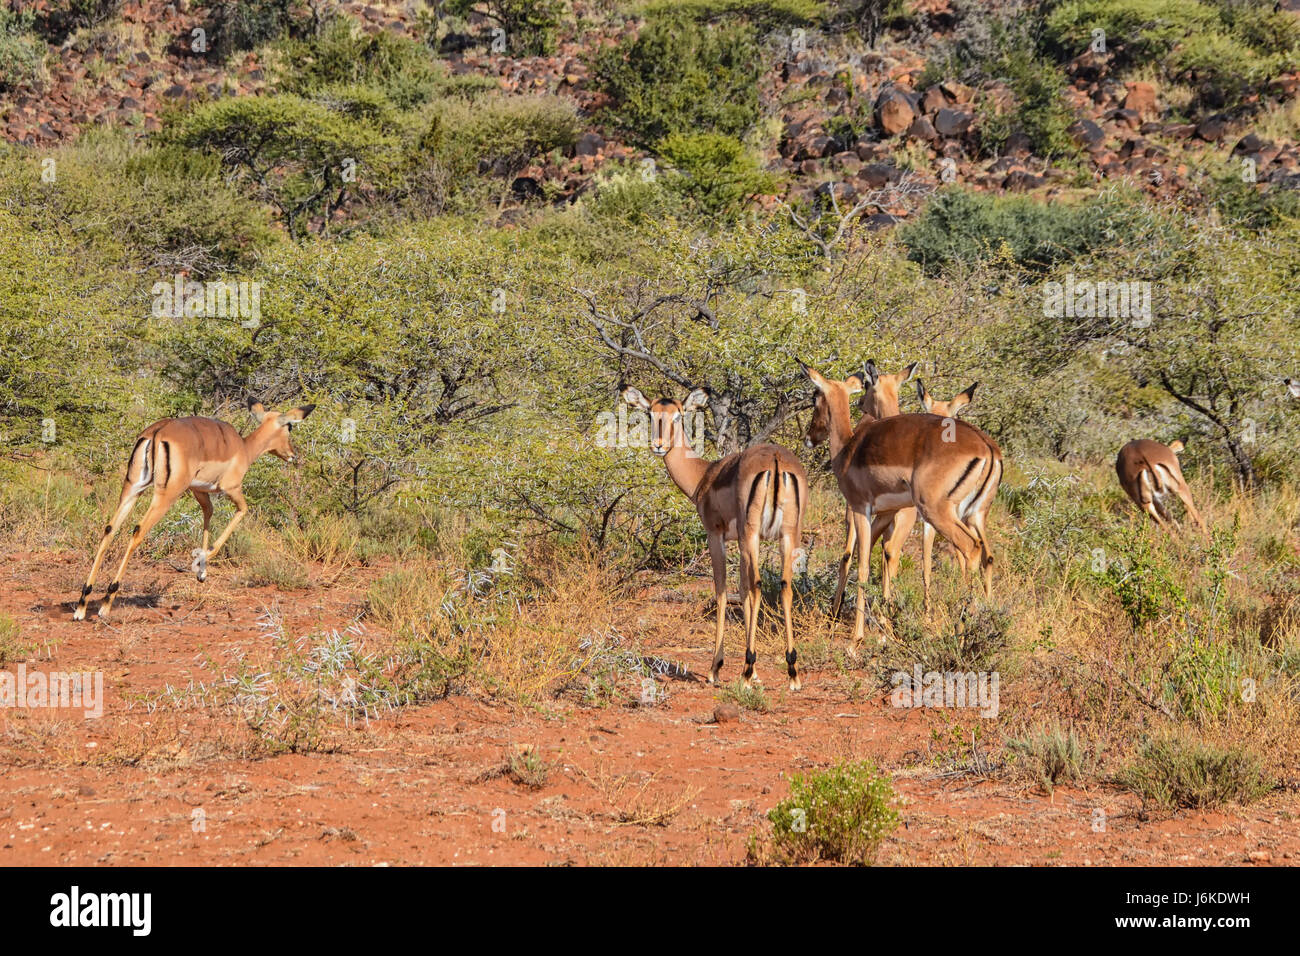 Impala photos - Aepyceros melampus | Arkive